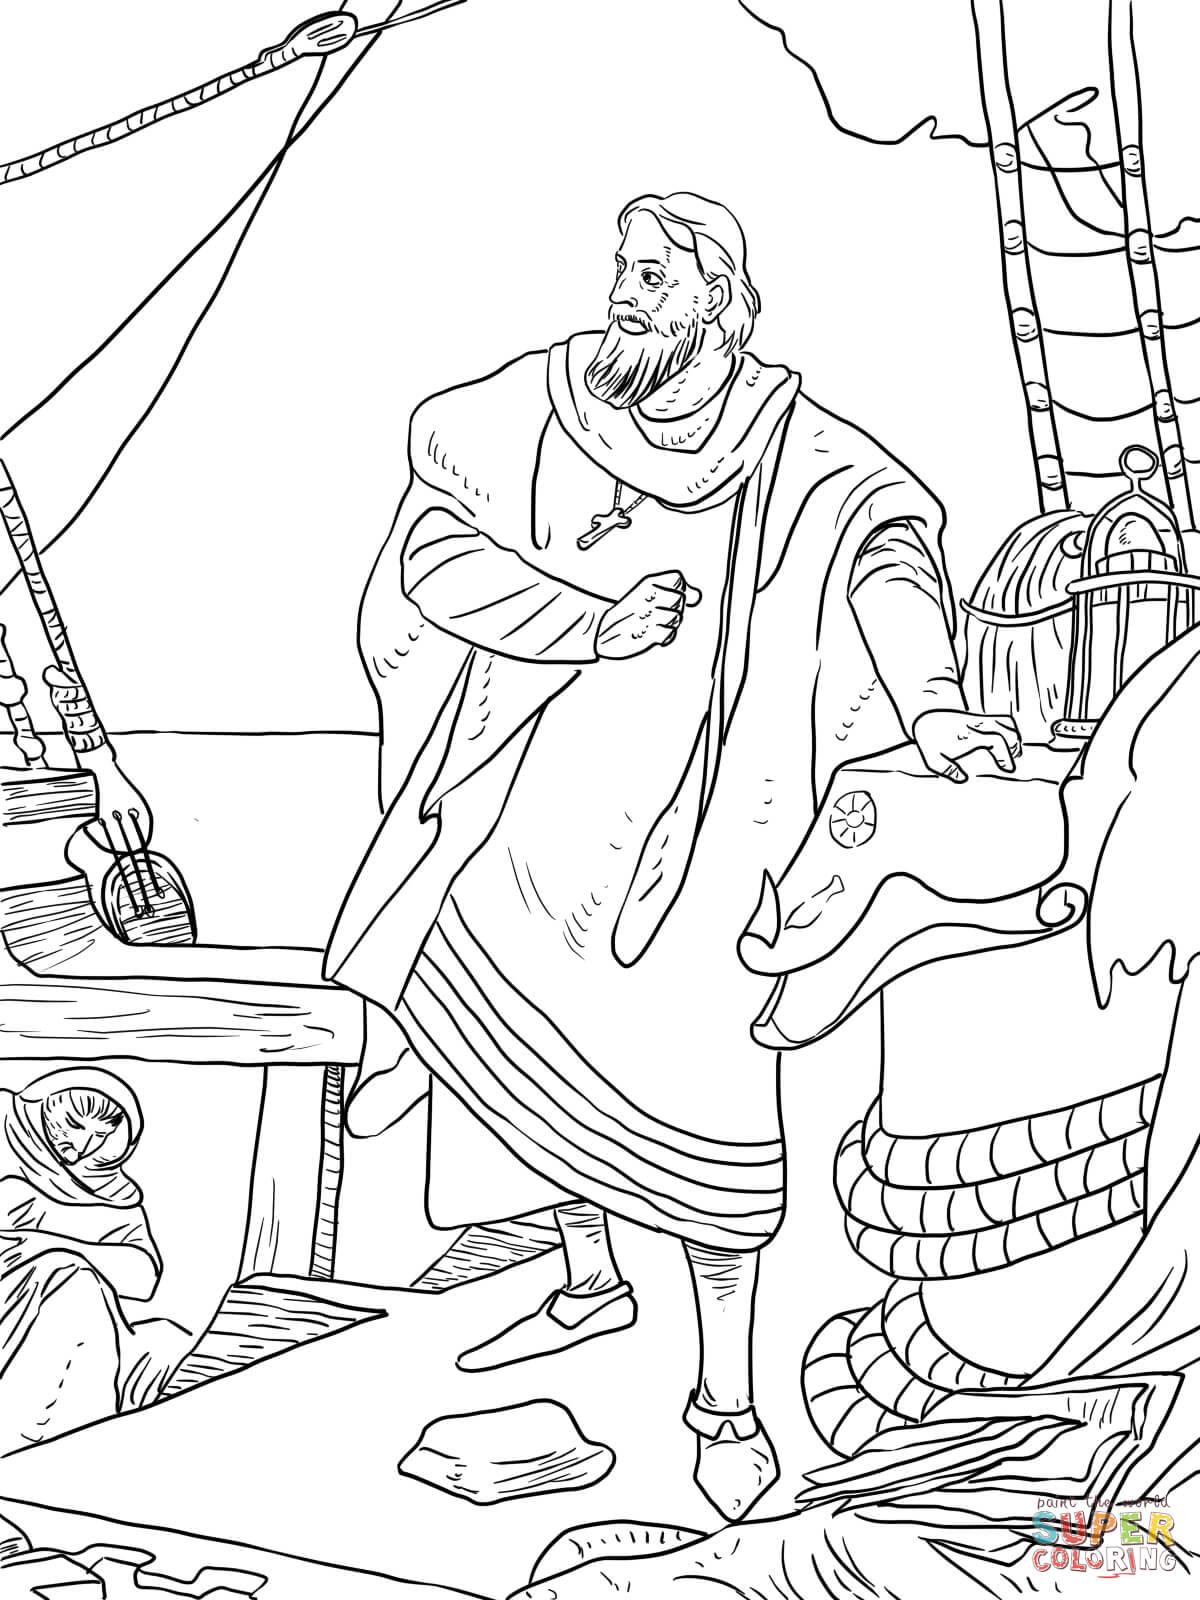 Christopher Columbus S Nt M Ri Col G P Ge Free